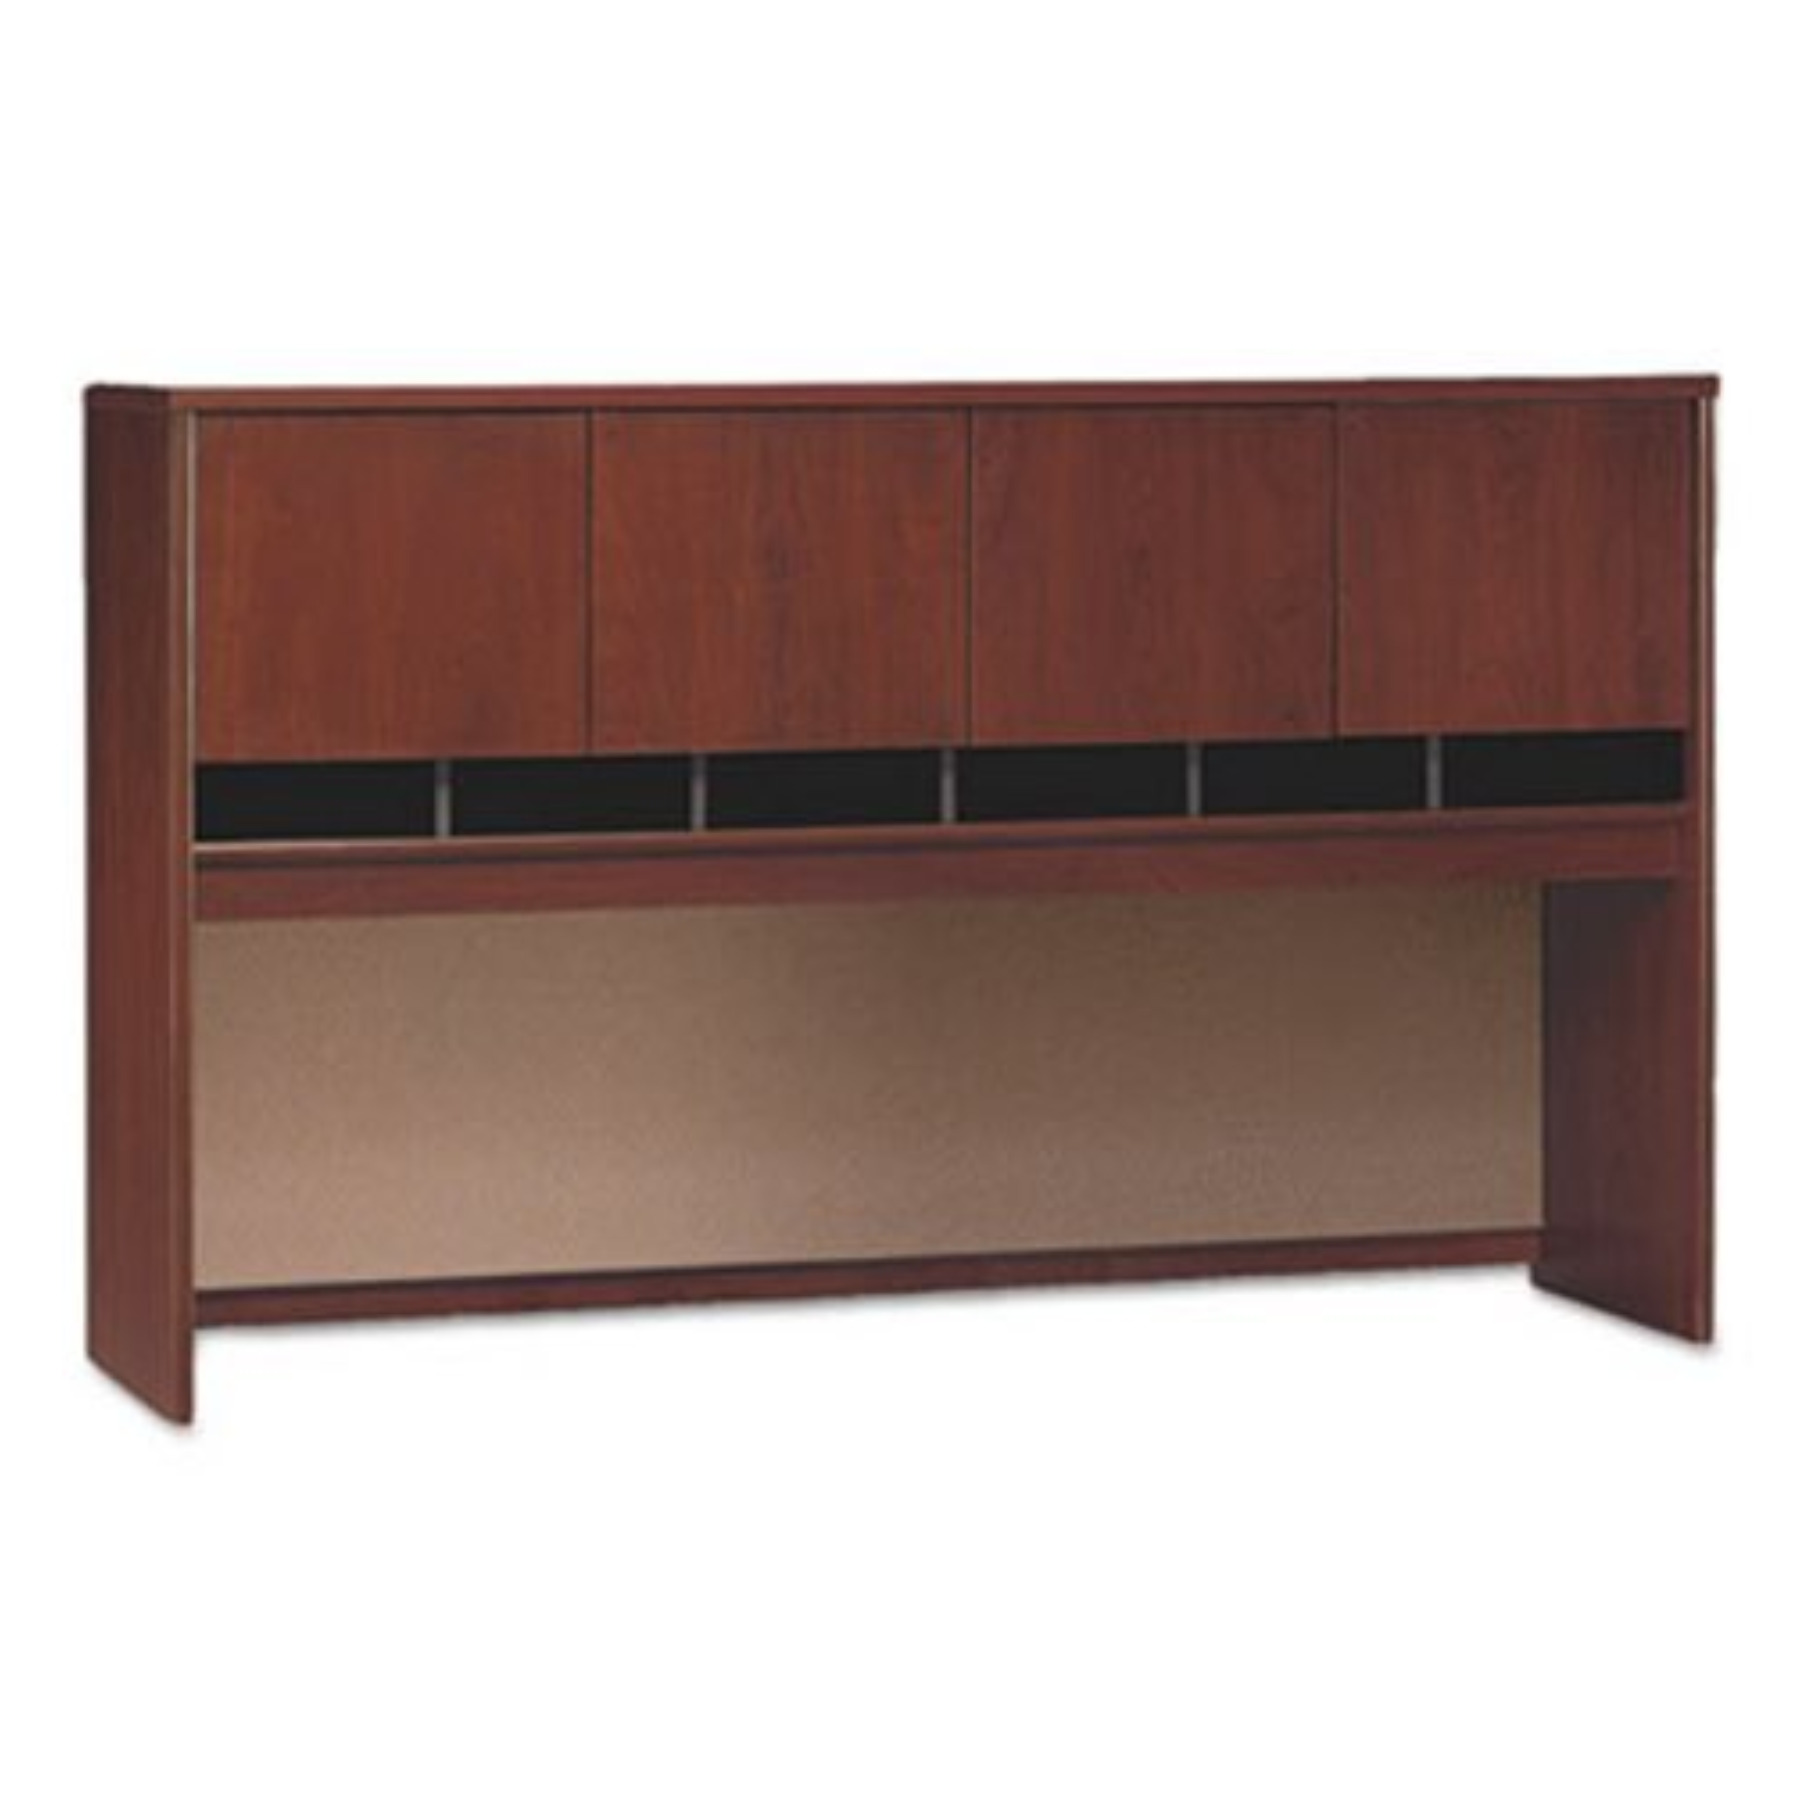 Series C Collection 72W Four-Door Hutch, Box 1 of 2, Hansen Cherry